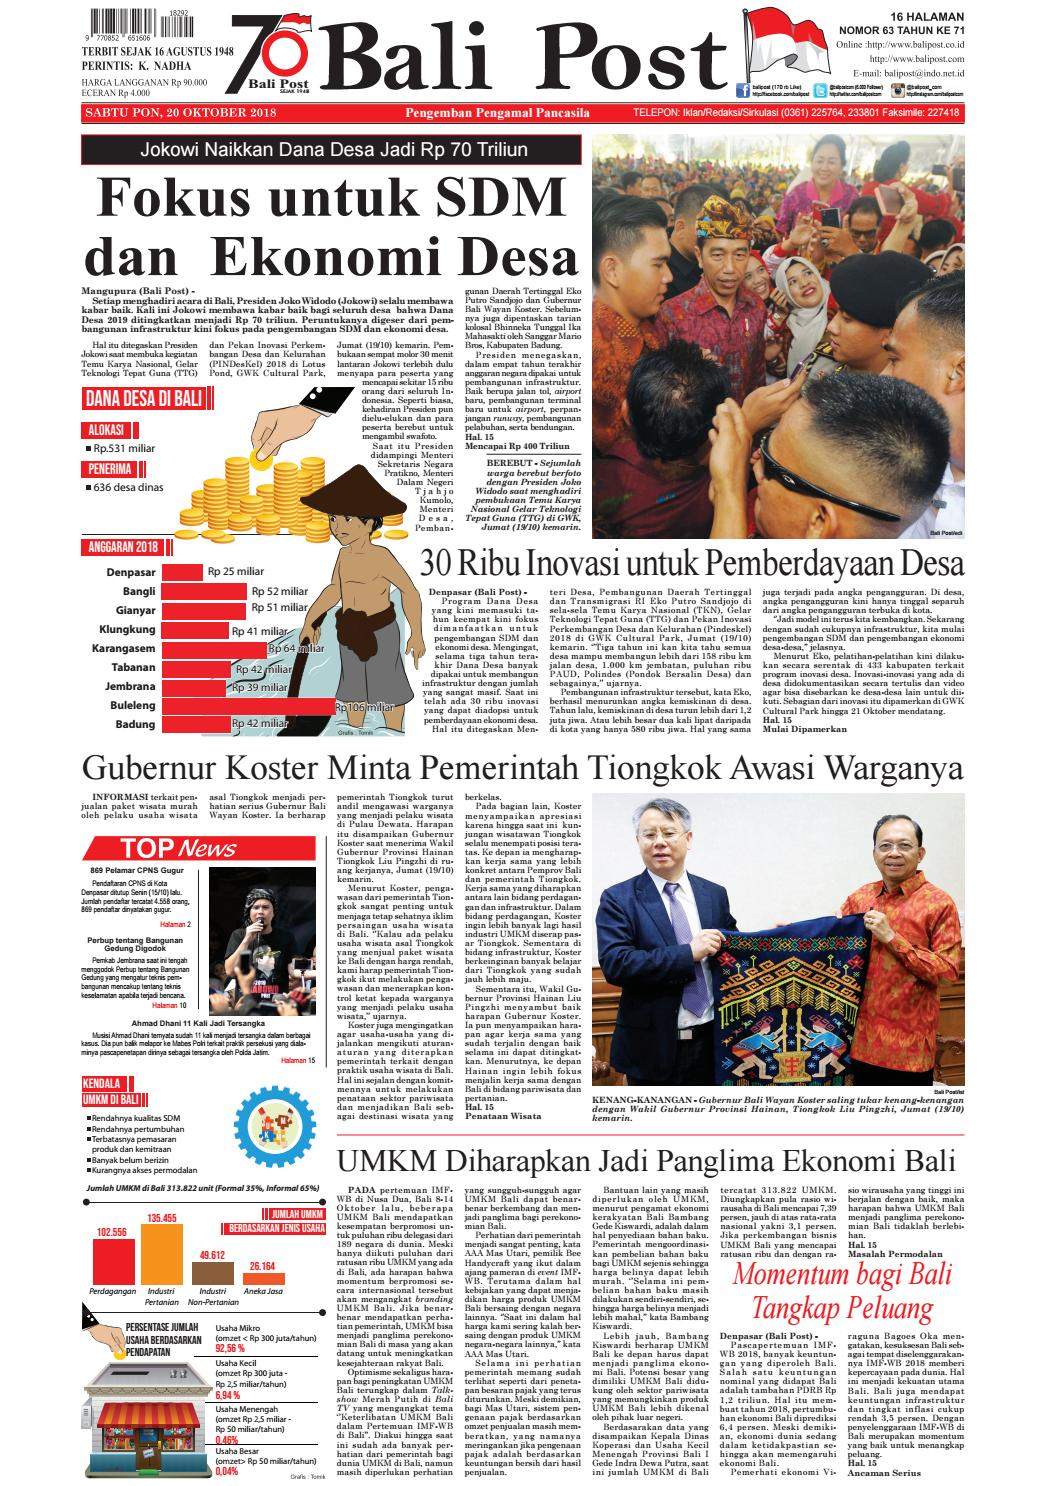 Edisi Sabtu 10 Oktober 2018 Balipostcom By E Paper Kmb Issuu Produk Ukm Bumn Ring Mutiara Mas Putih Laut